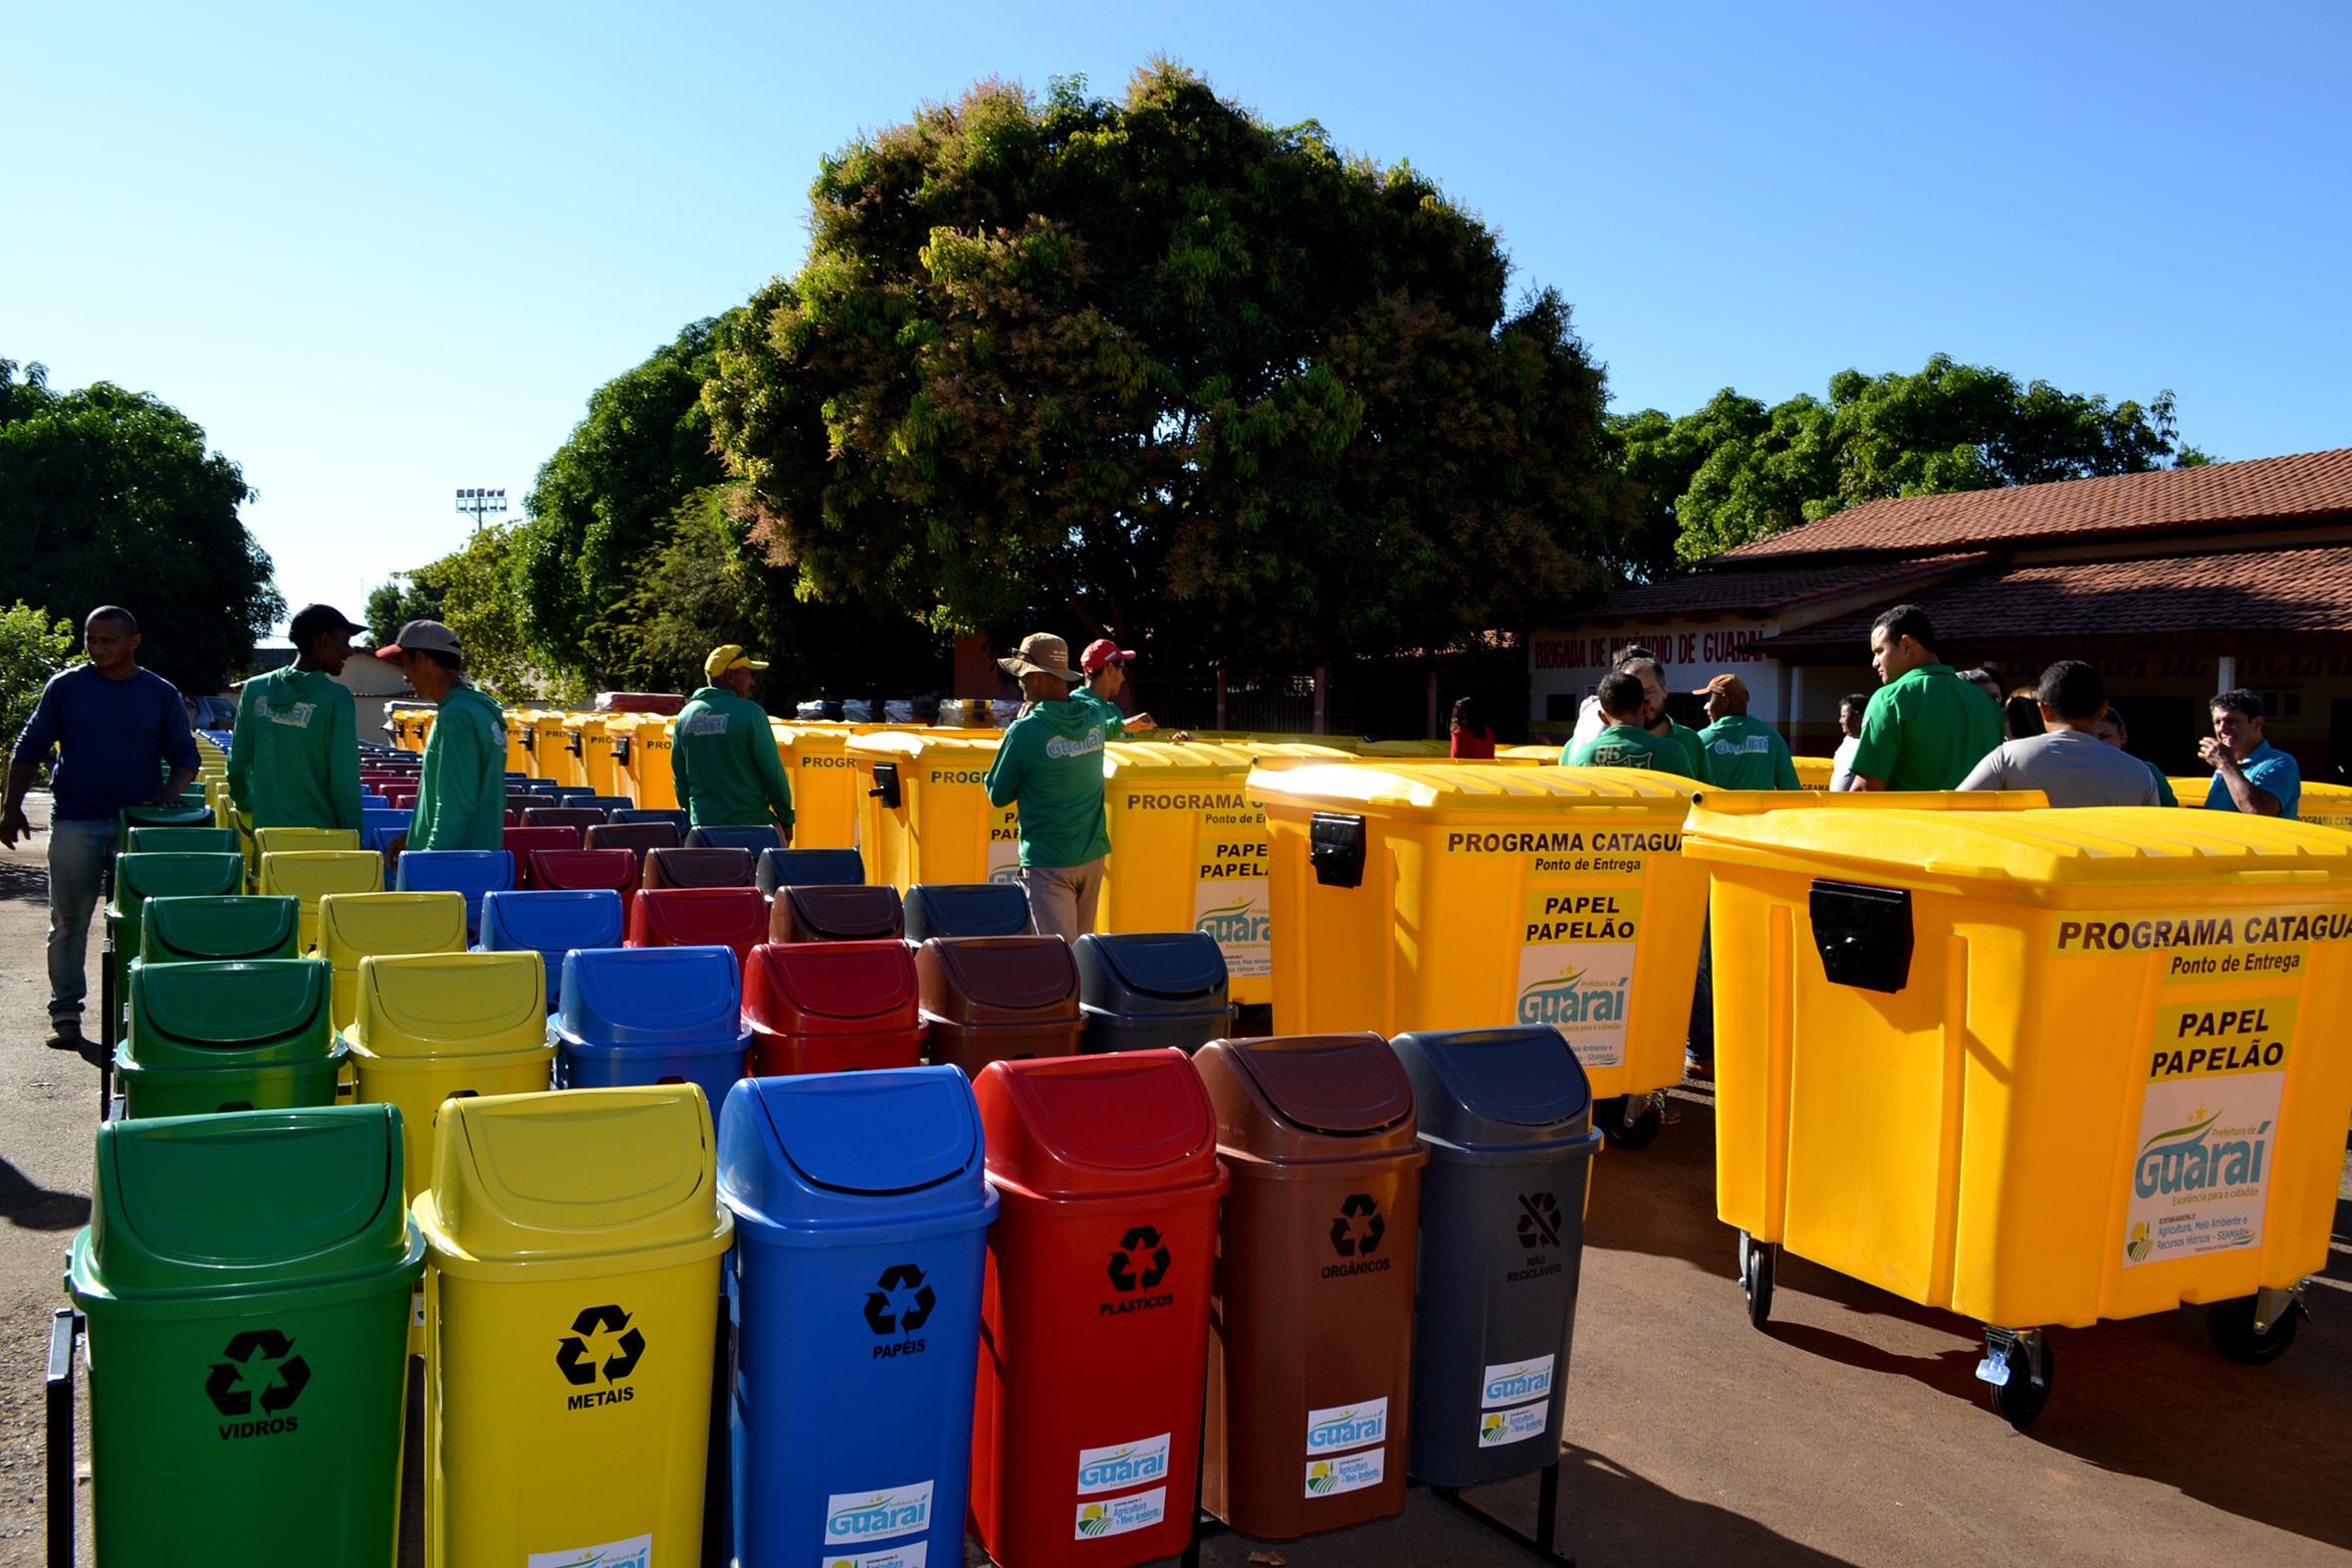 "Lixeiras e contêineres do programa ""Cataguará"" começam a ser instaladas na cidade de Guaraí"